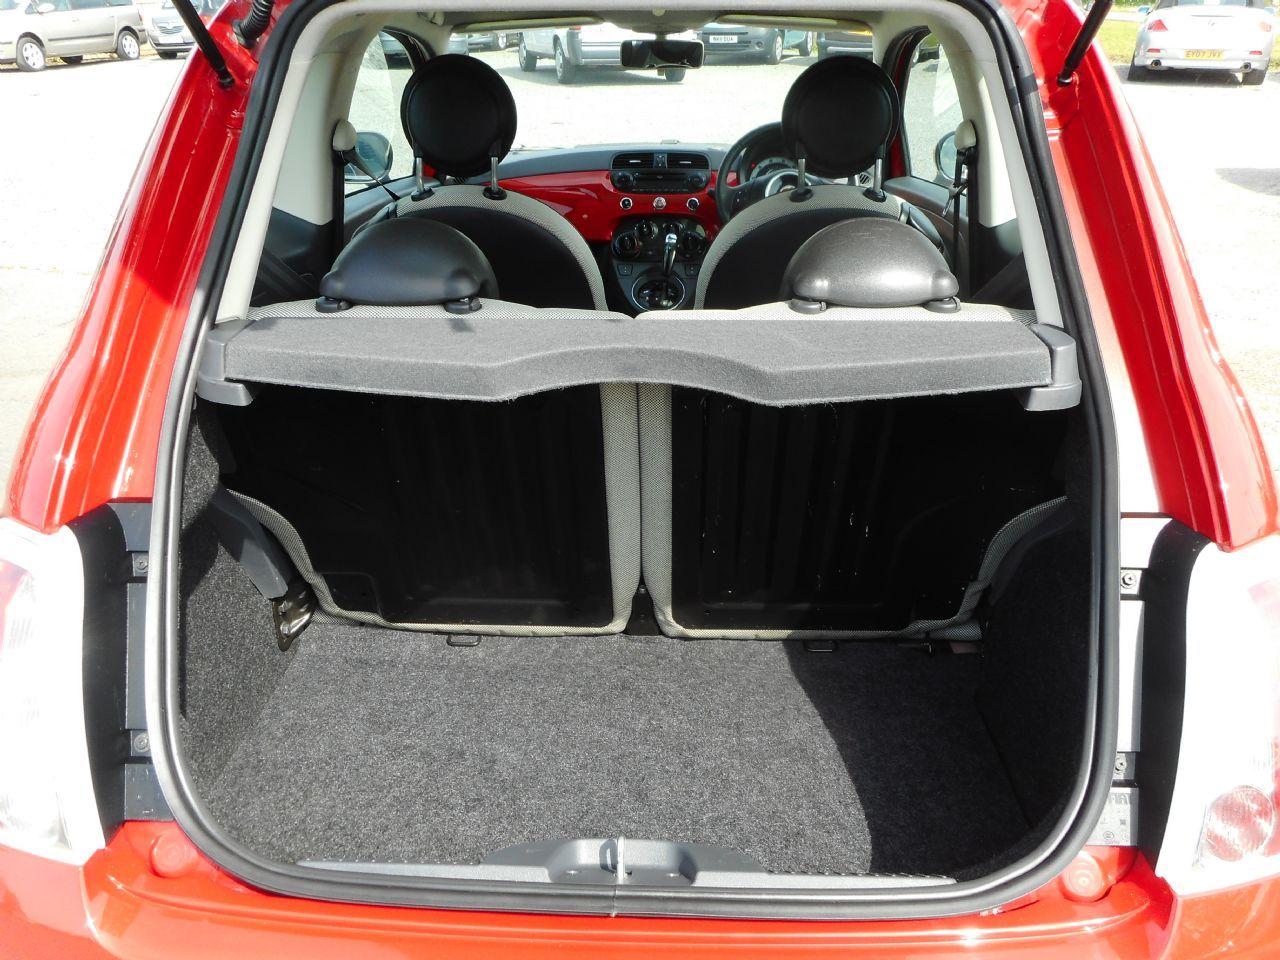 FIAT 500 1.2i Lounge S/S AUTO (2011) - Picture 15